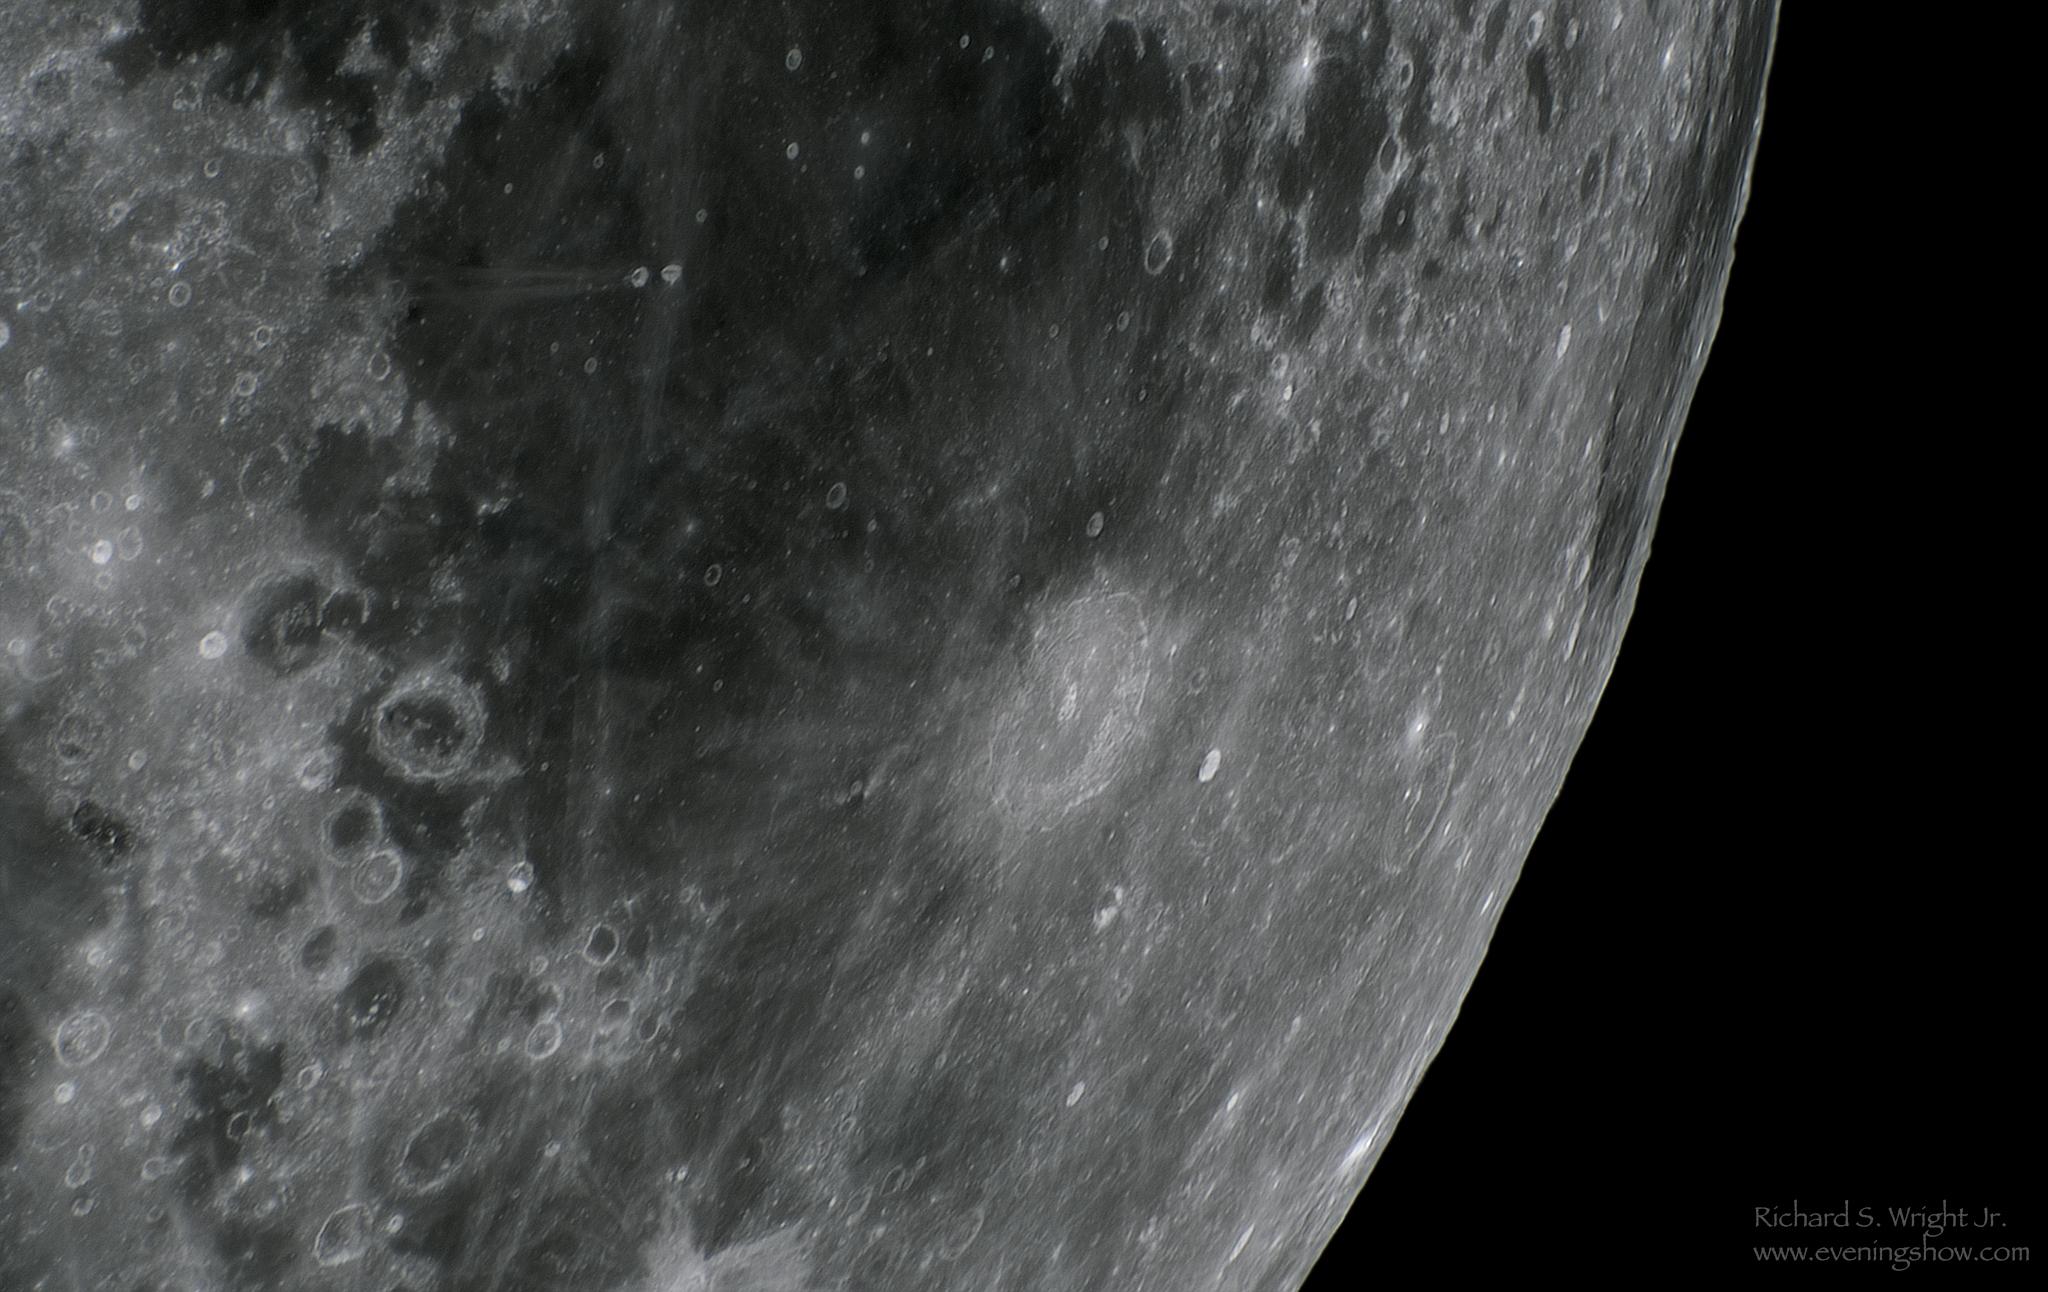 The Crater Langrenus